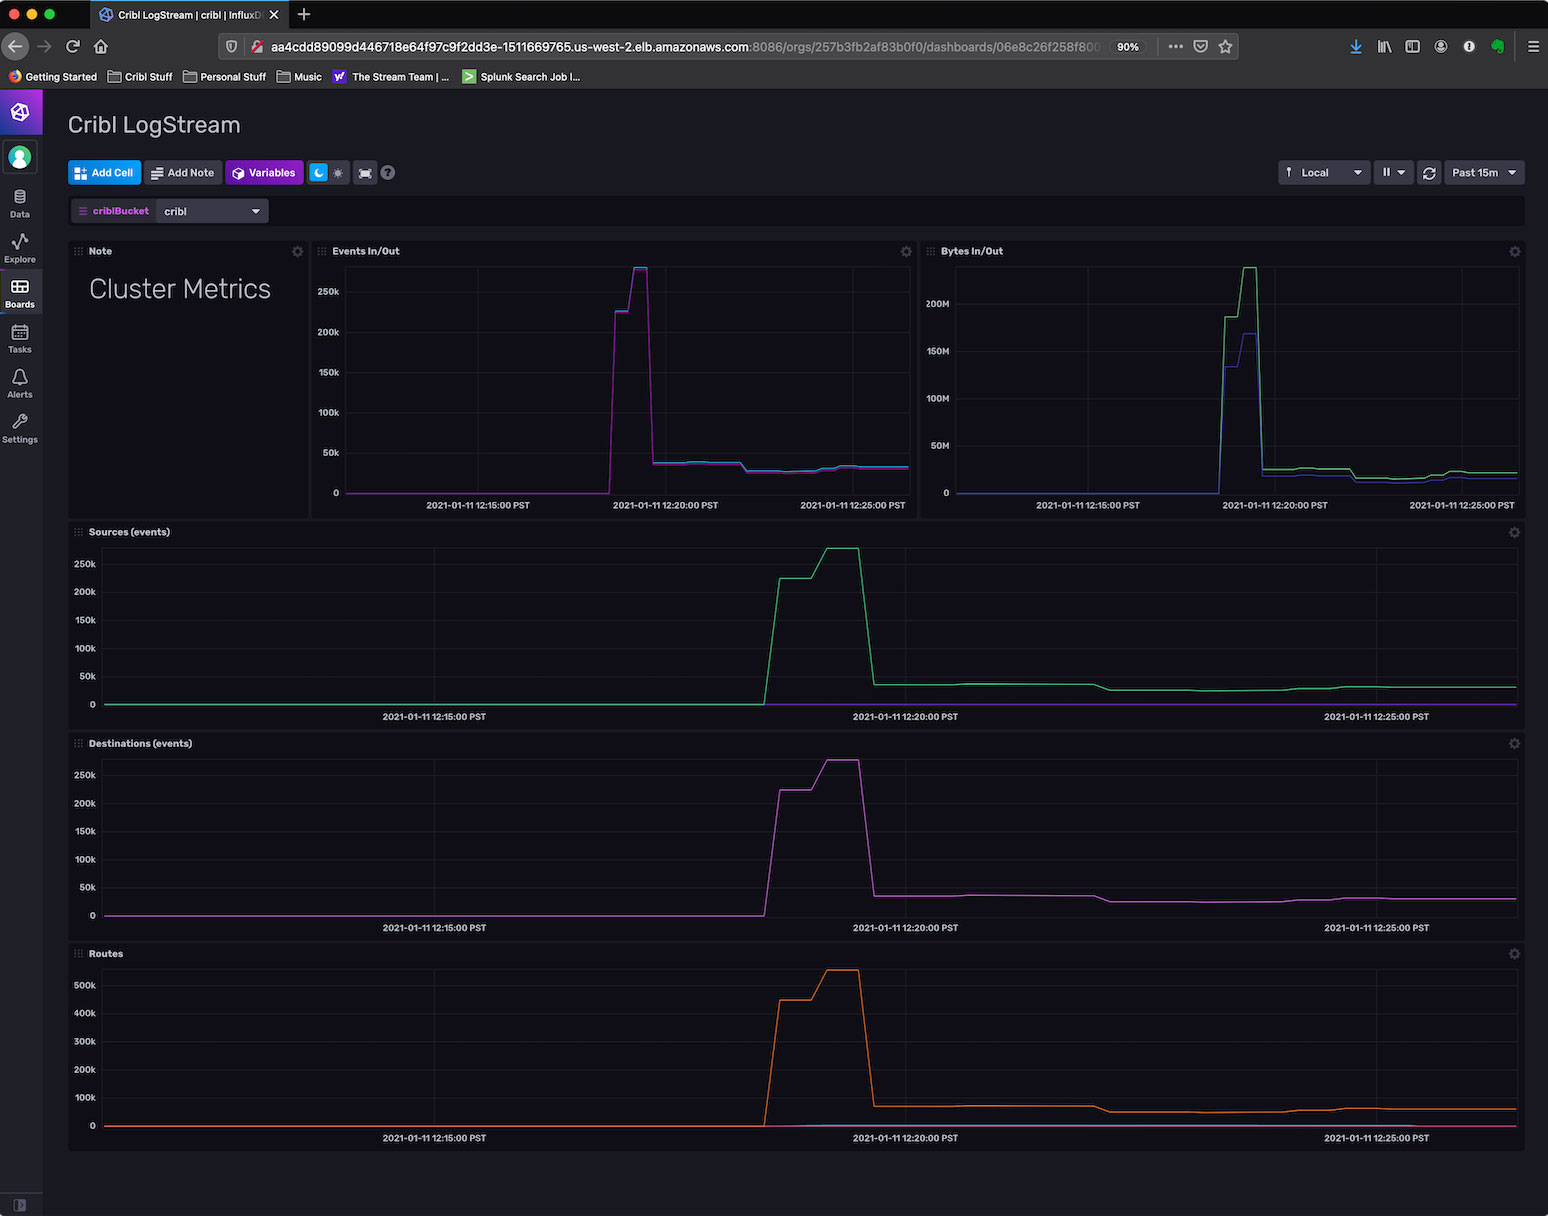 Cribl LogStream Monitoring Dashboard